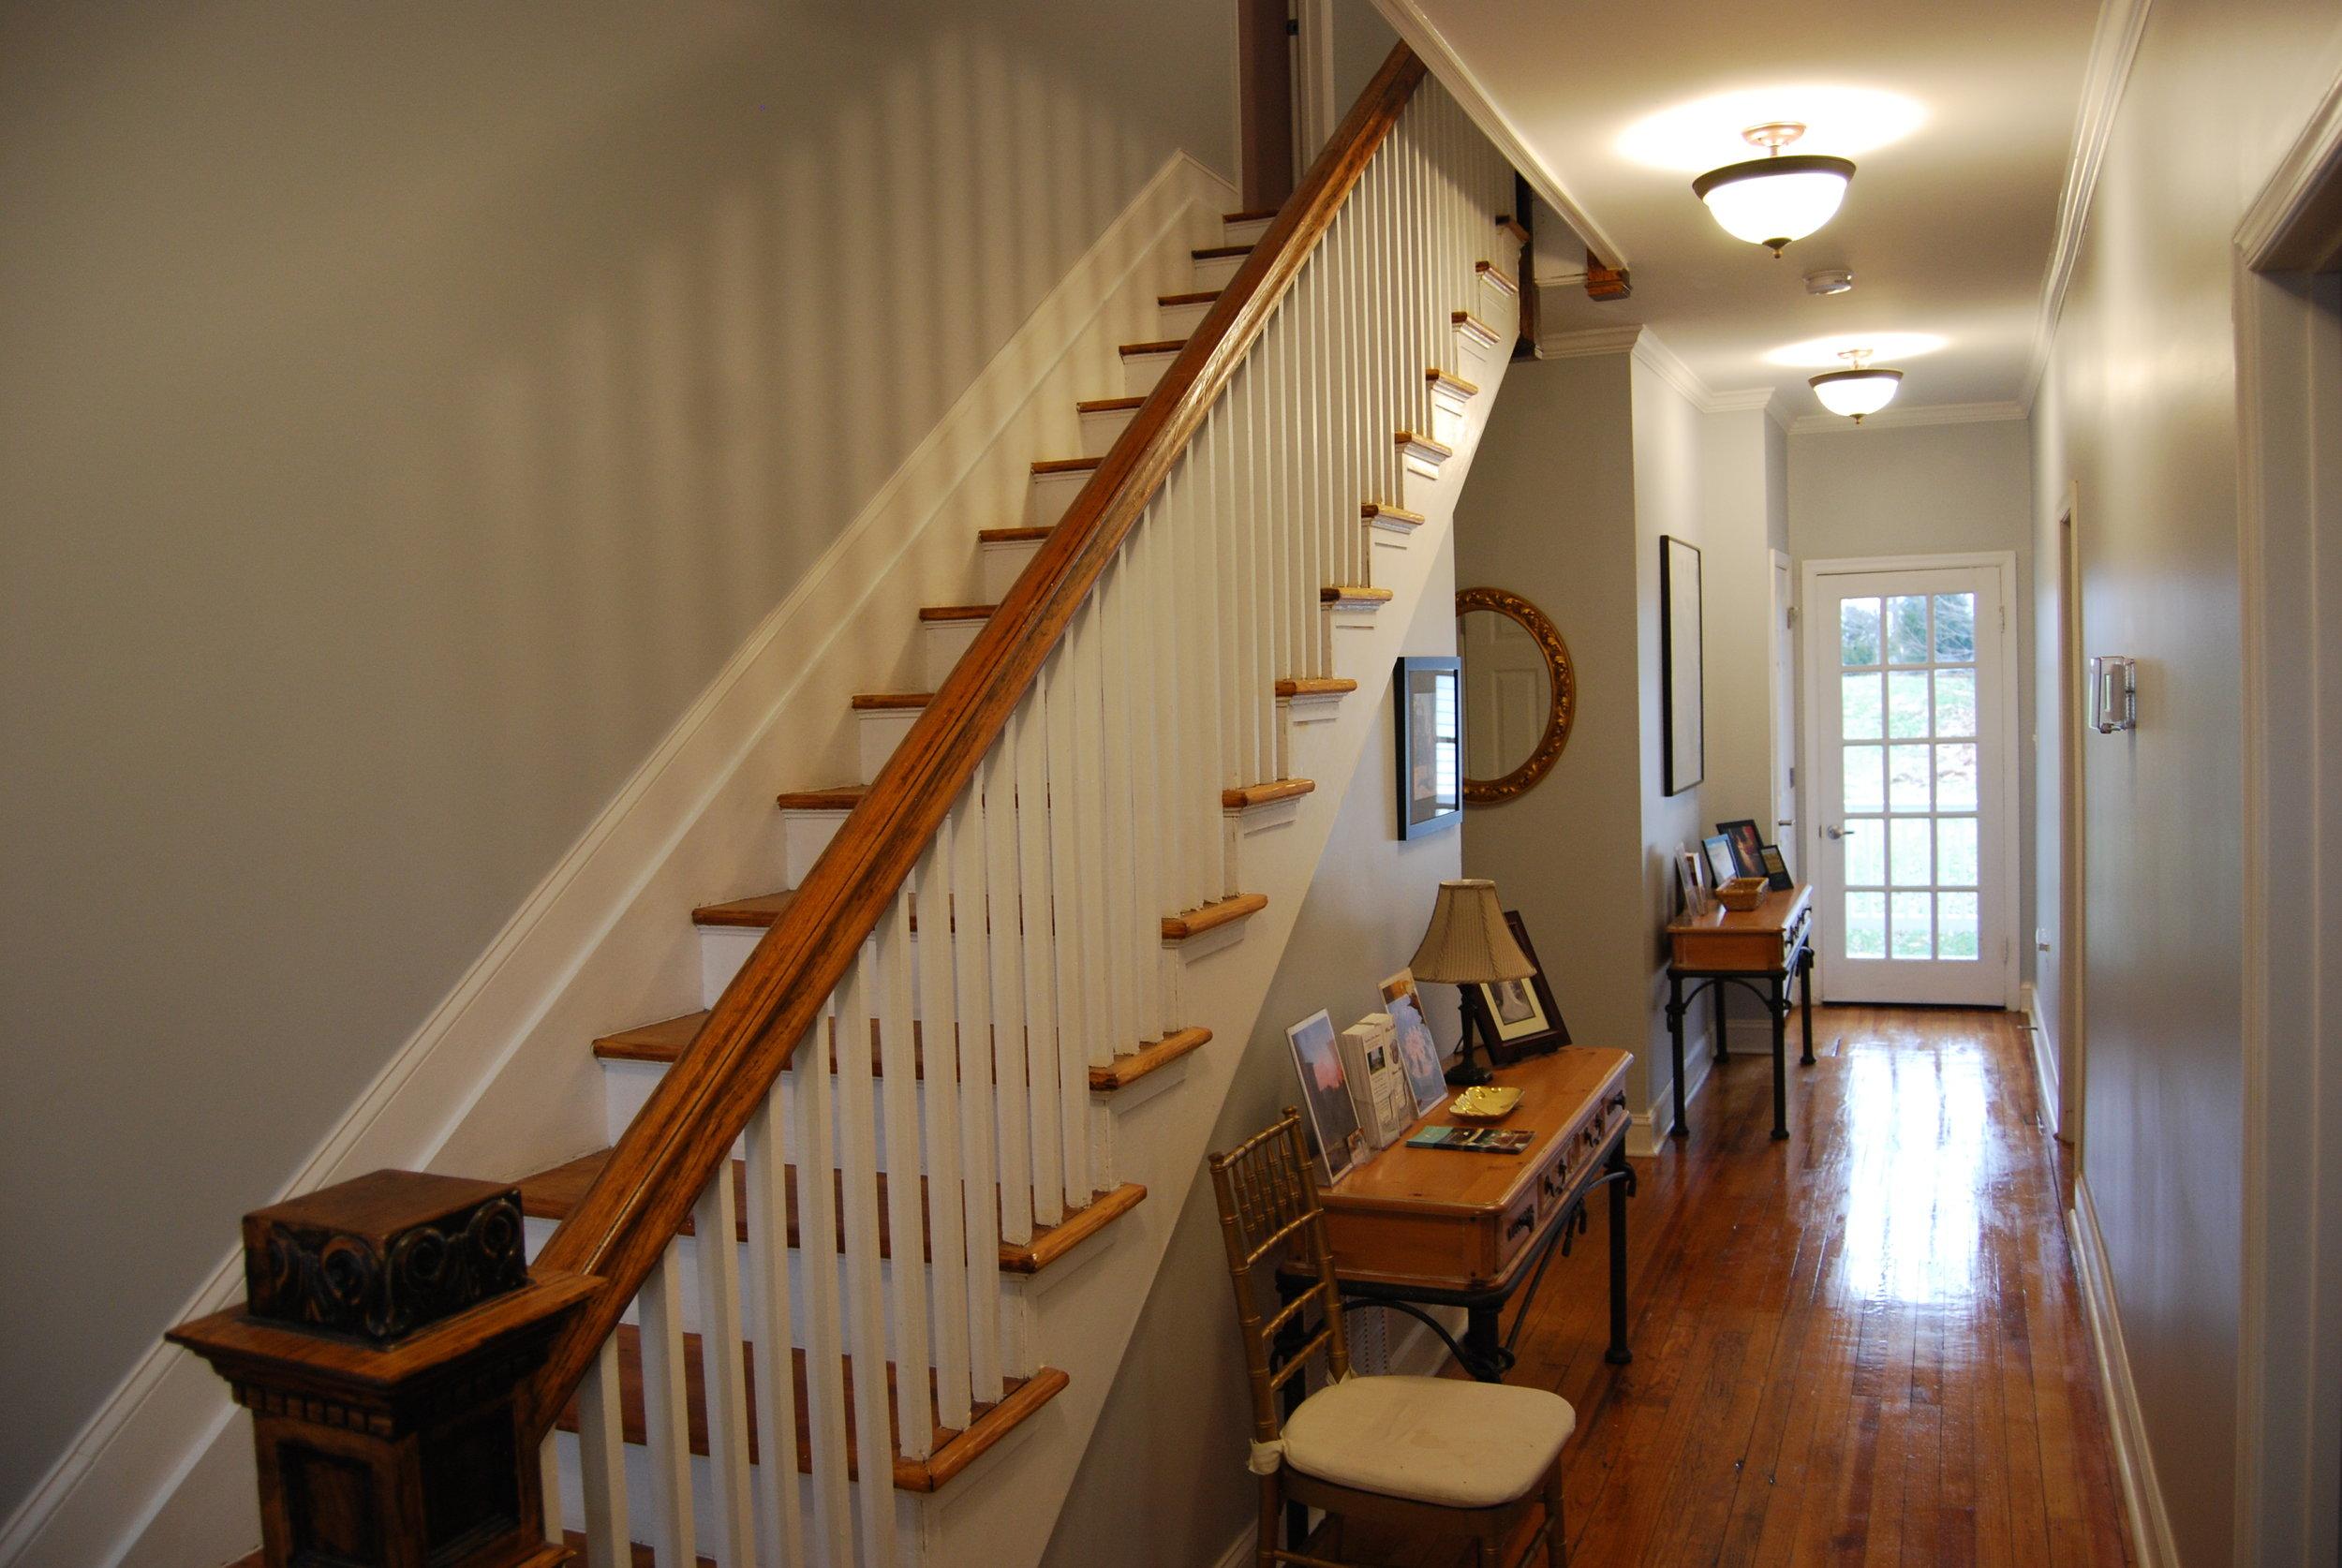 downstairs hallway 2.JPG